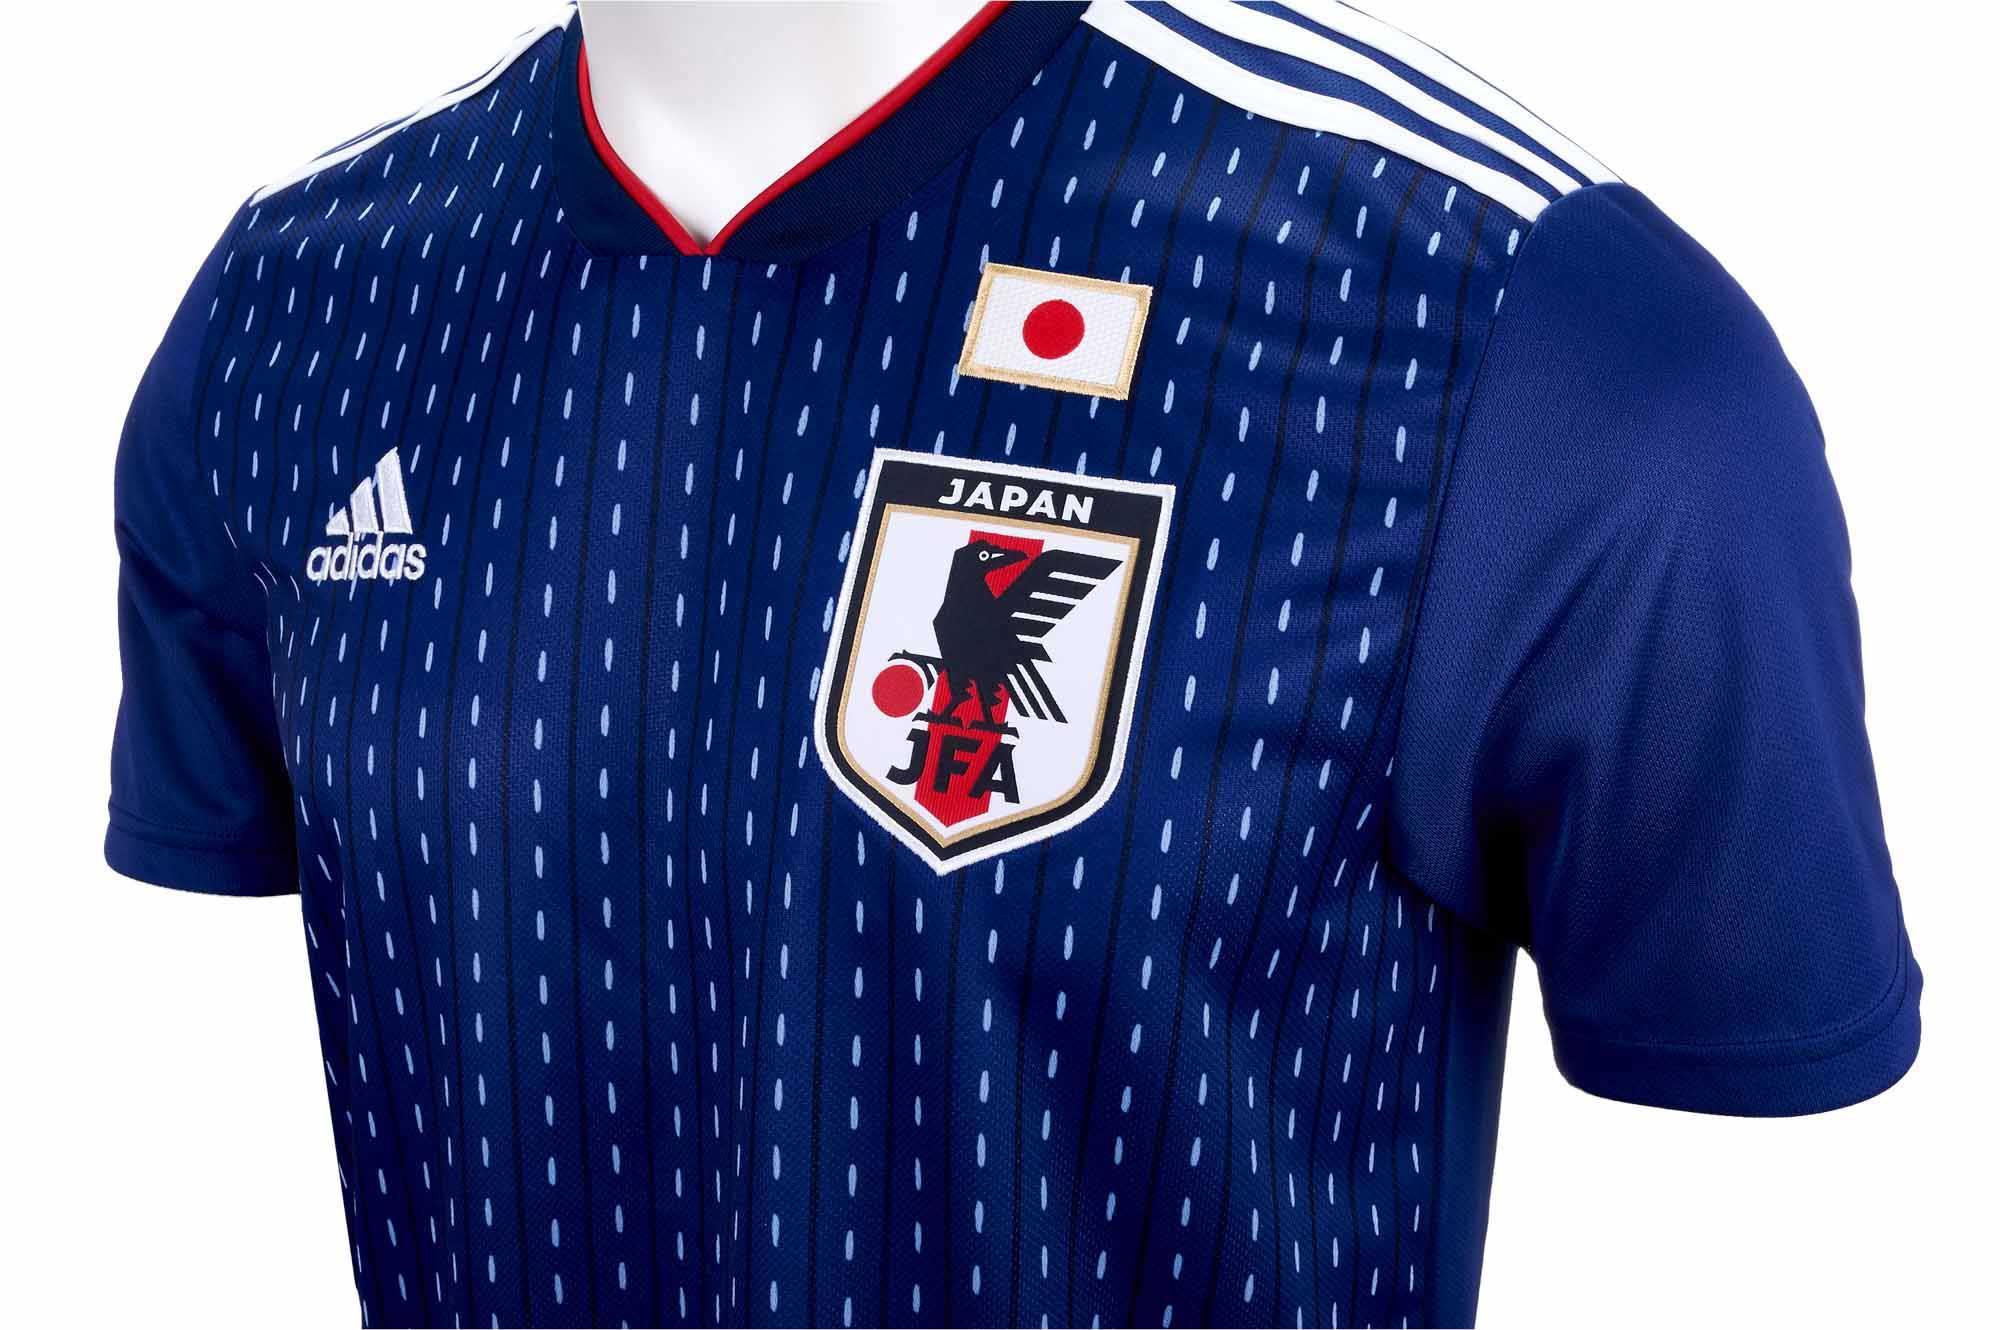 8846f5f4864 adidas Kids Japan Home Jersey 2018-19 - SoccerPro.com